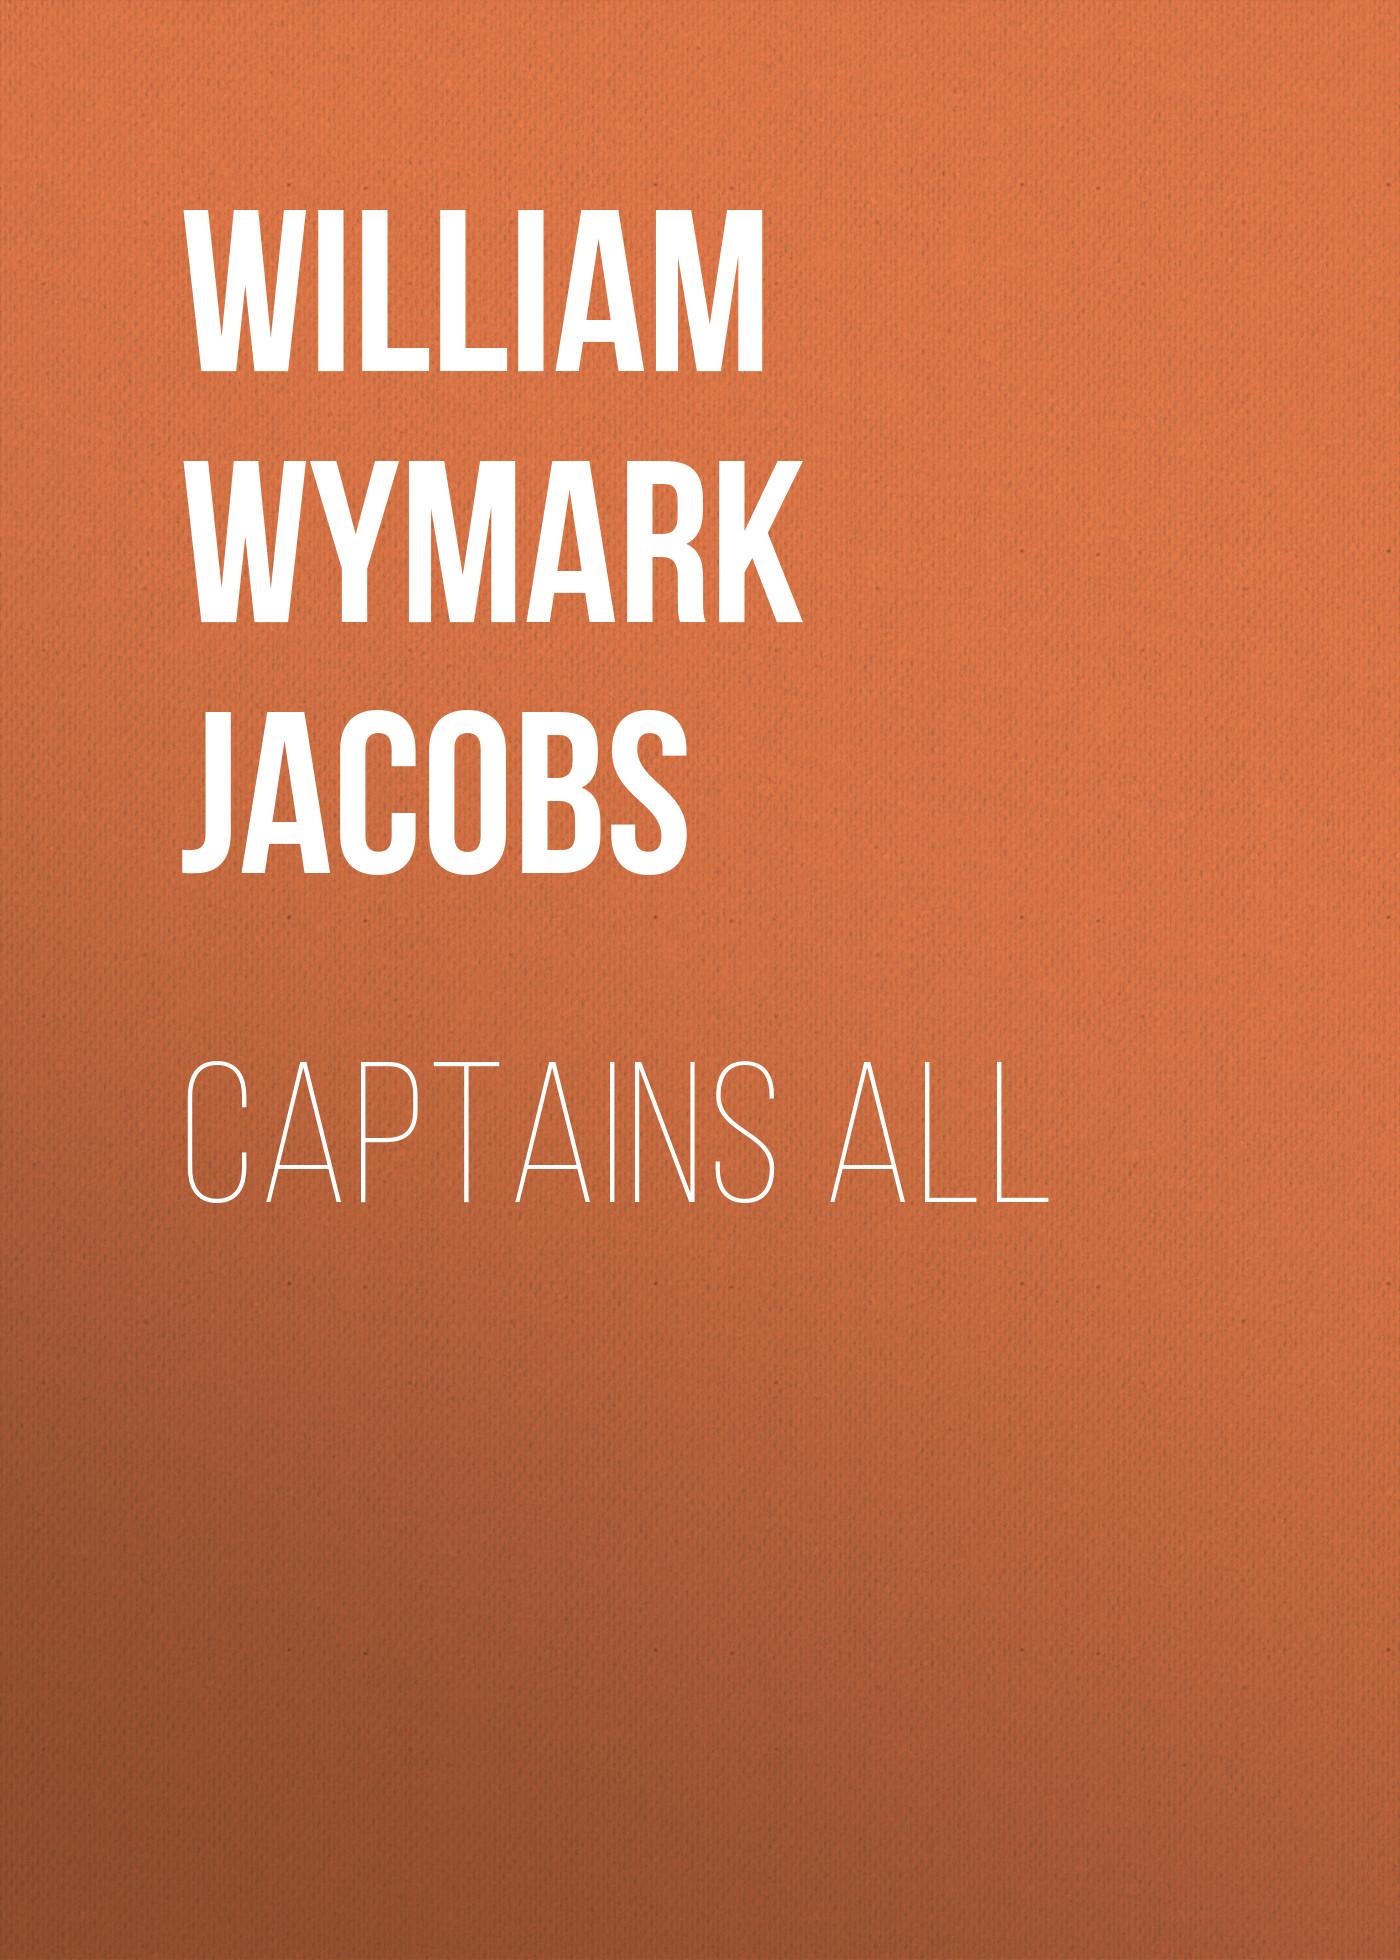 лучшая цена William Wymark Jacobs Captains All